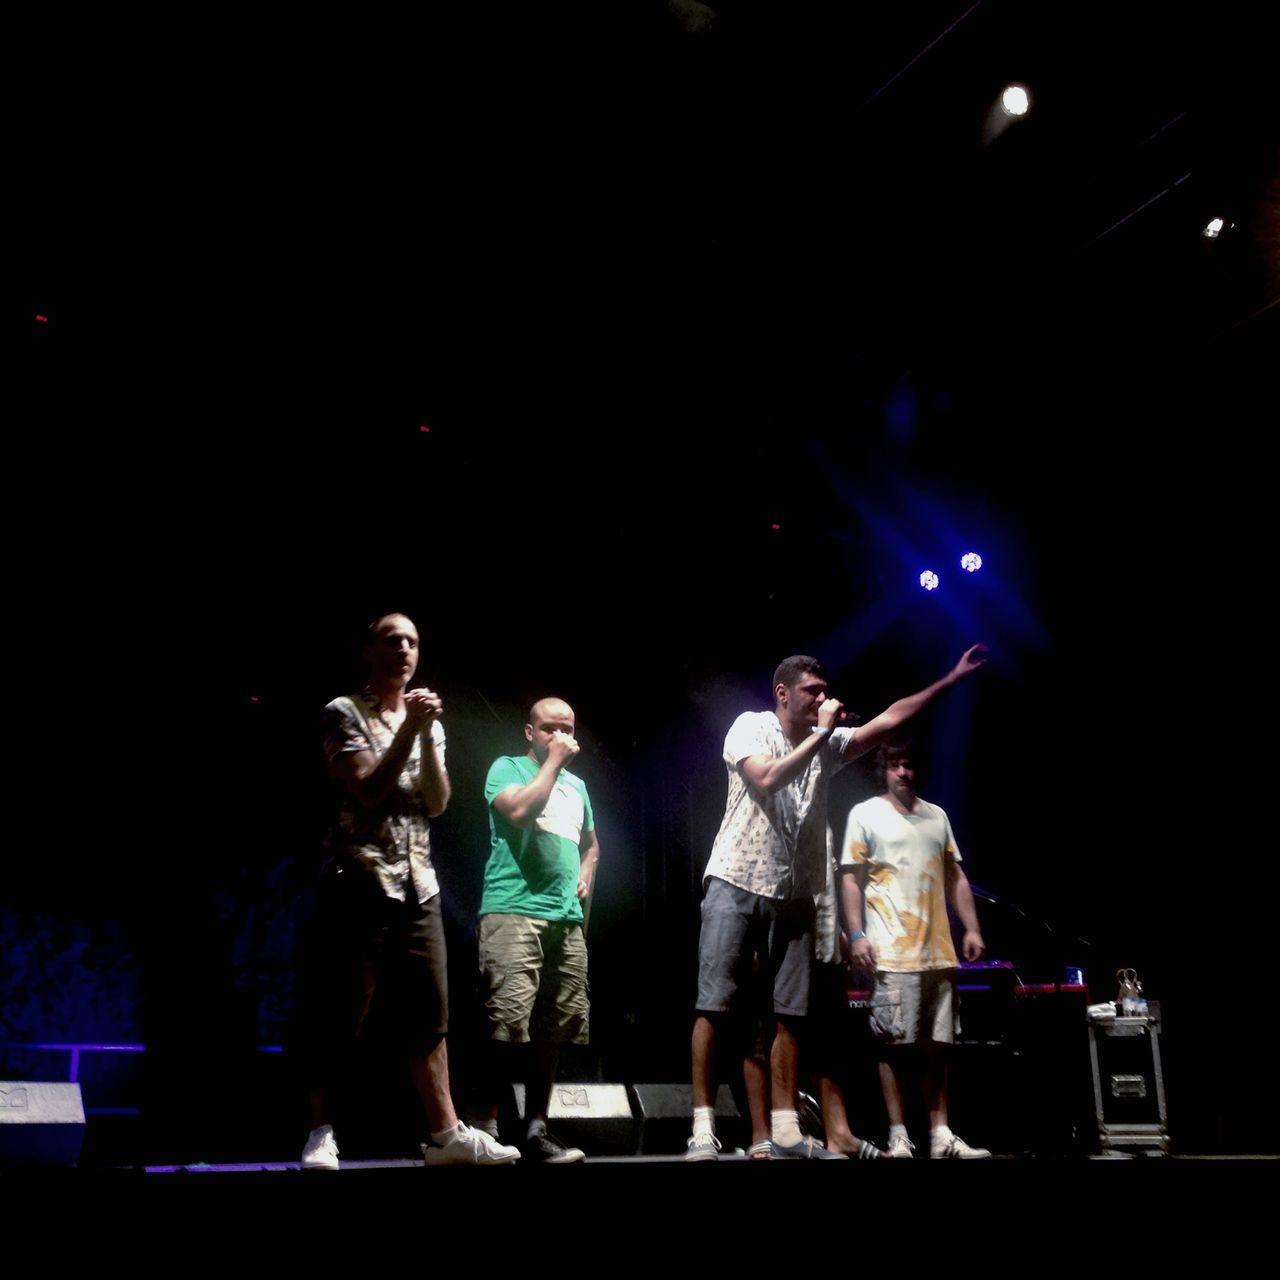 Criolo at Carroponte  - Concert Brasilian Live Music